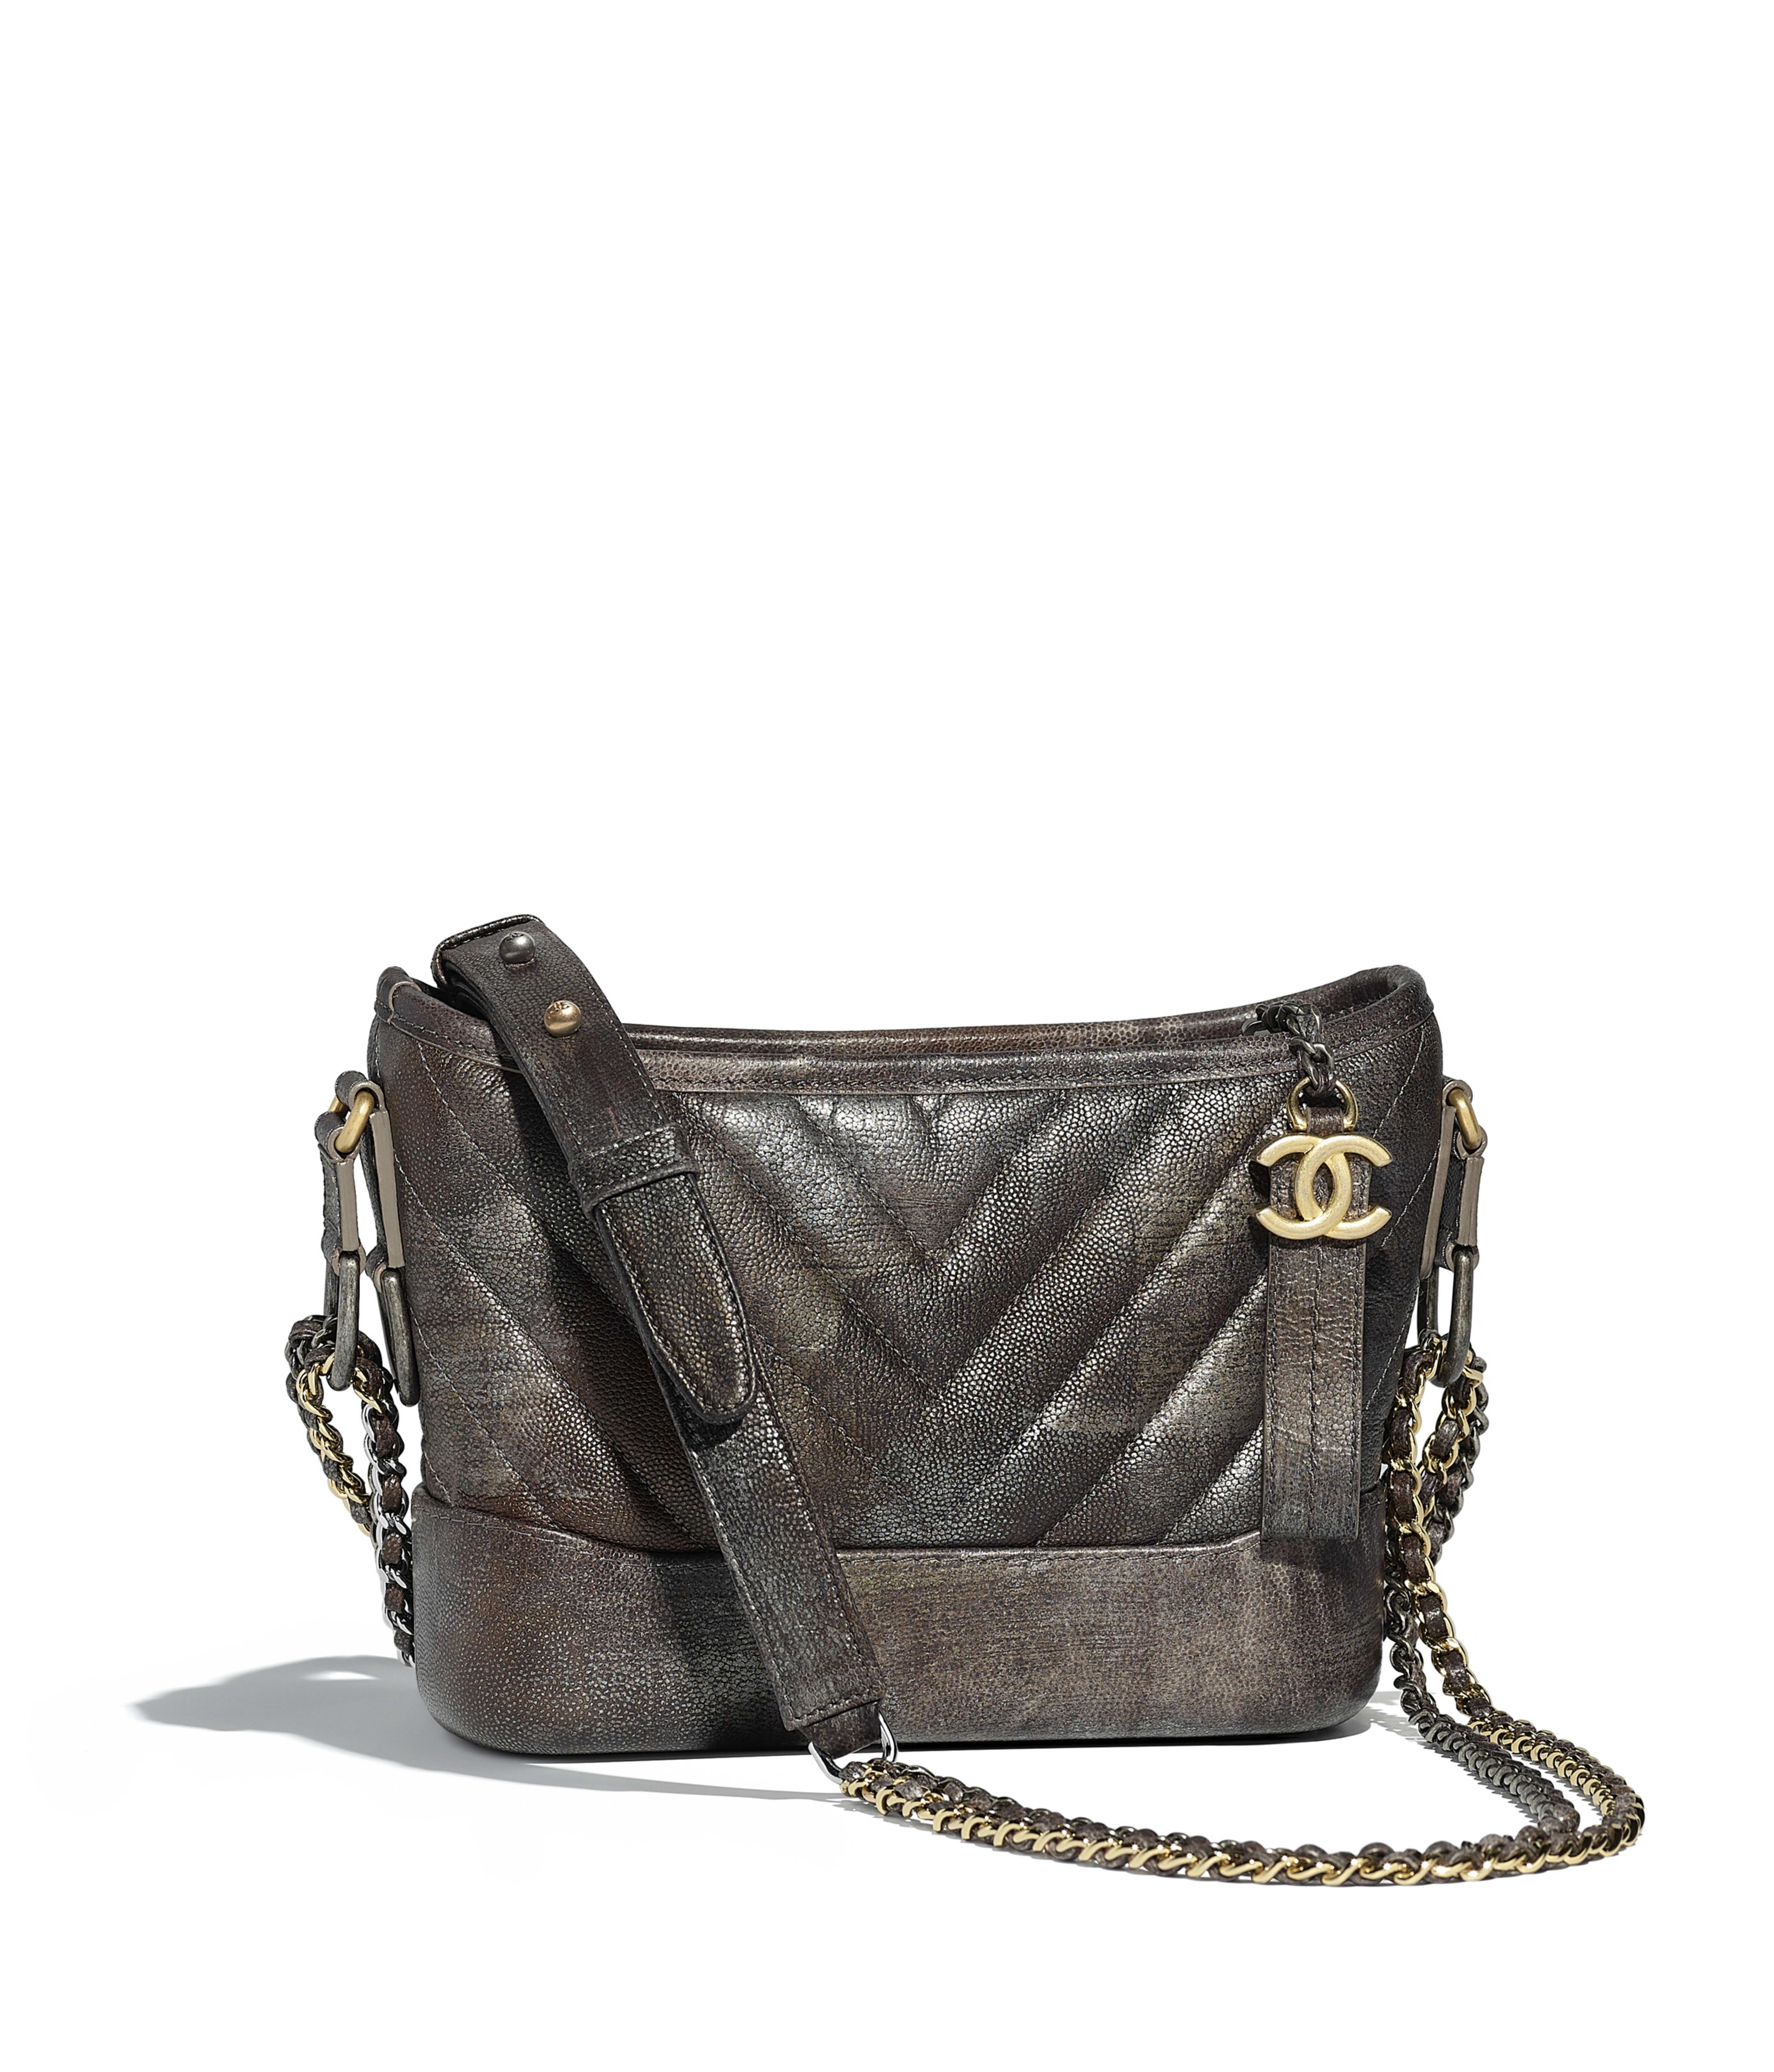 beab74ded6e CHANEL S GABRIELLE Small Hobo Bag Metallic Grained Goatskin, Silver-Tone    Gold-Tone Metal, Dark silver   gold Ref. A91810Y83933K1121